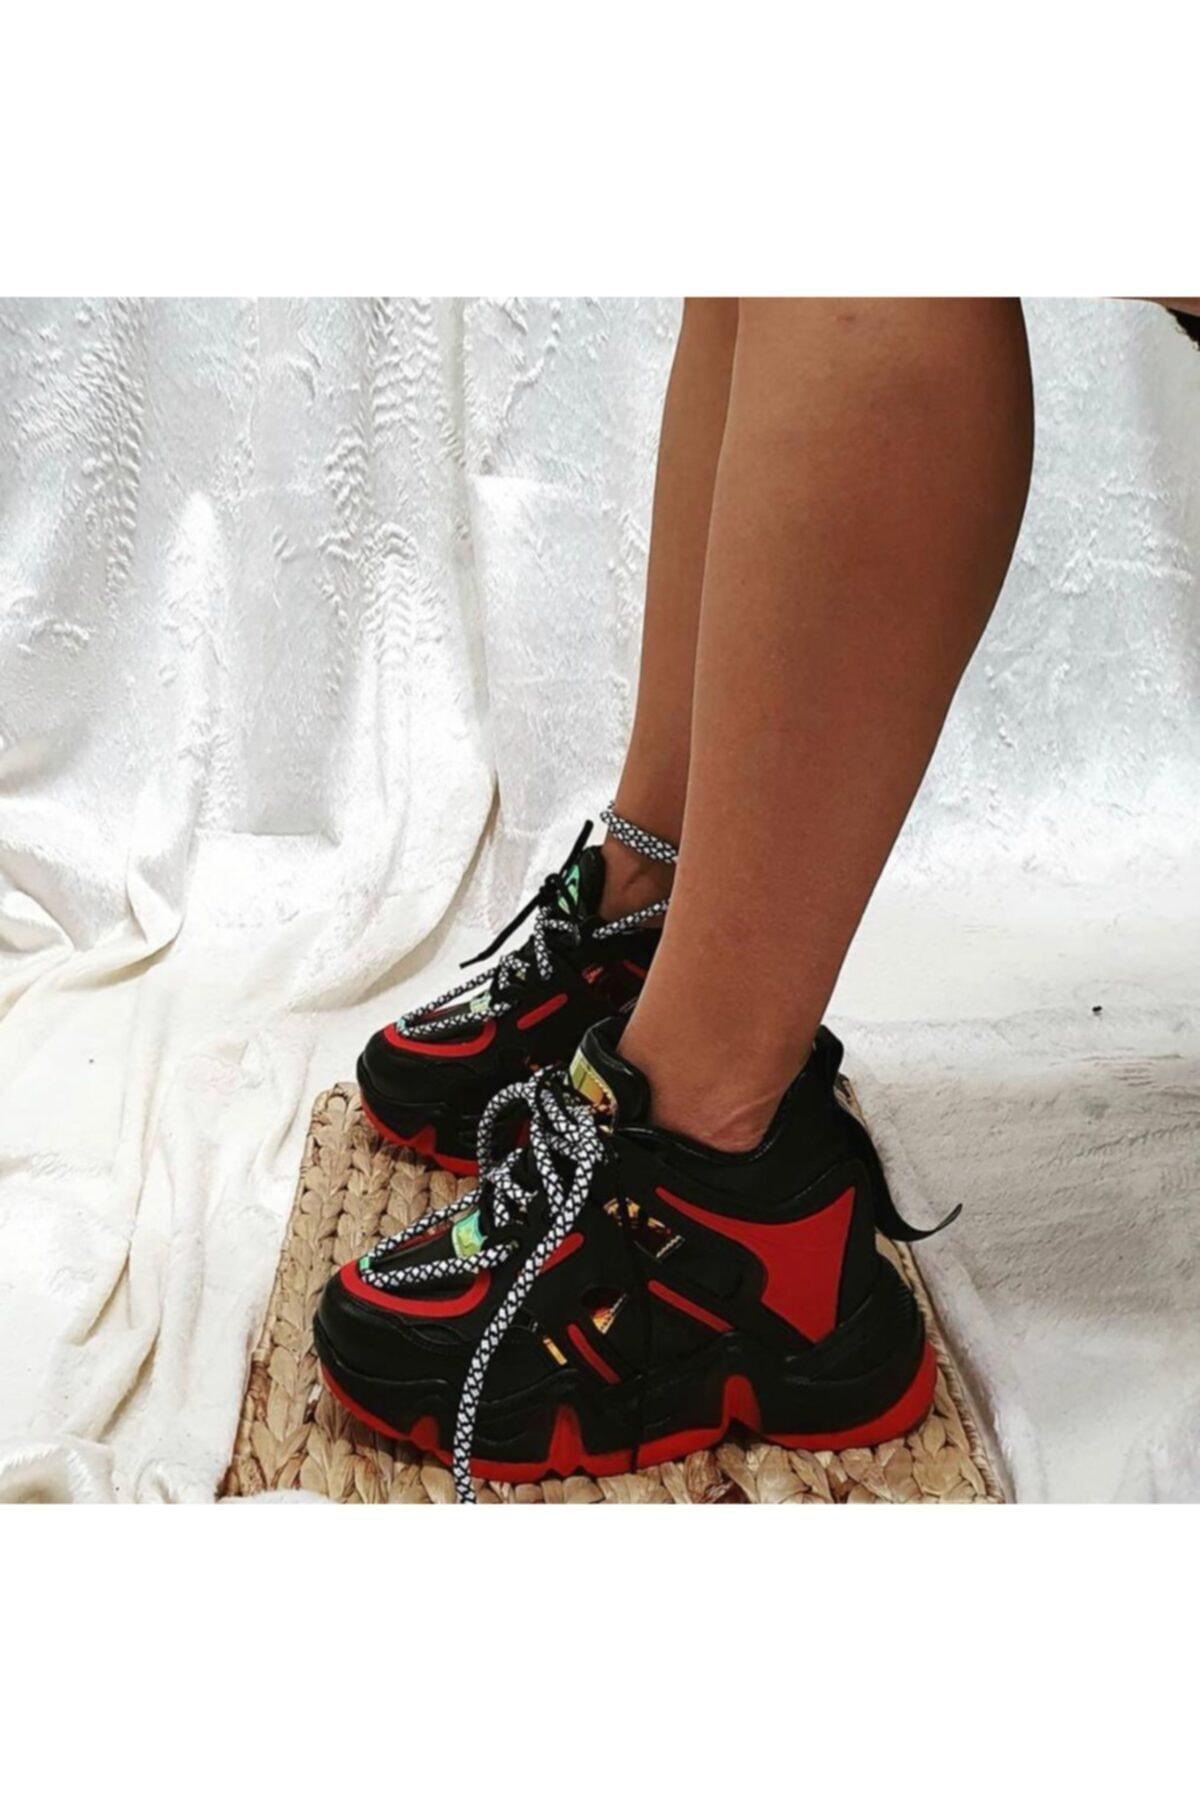 Shero shoes Kadın Siyah İçten Dolgulu Sneaker 1